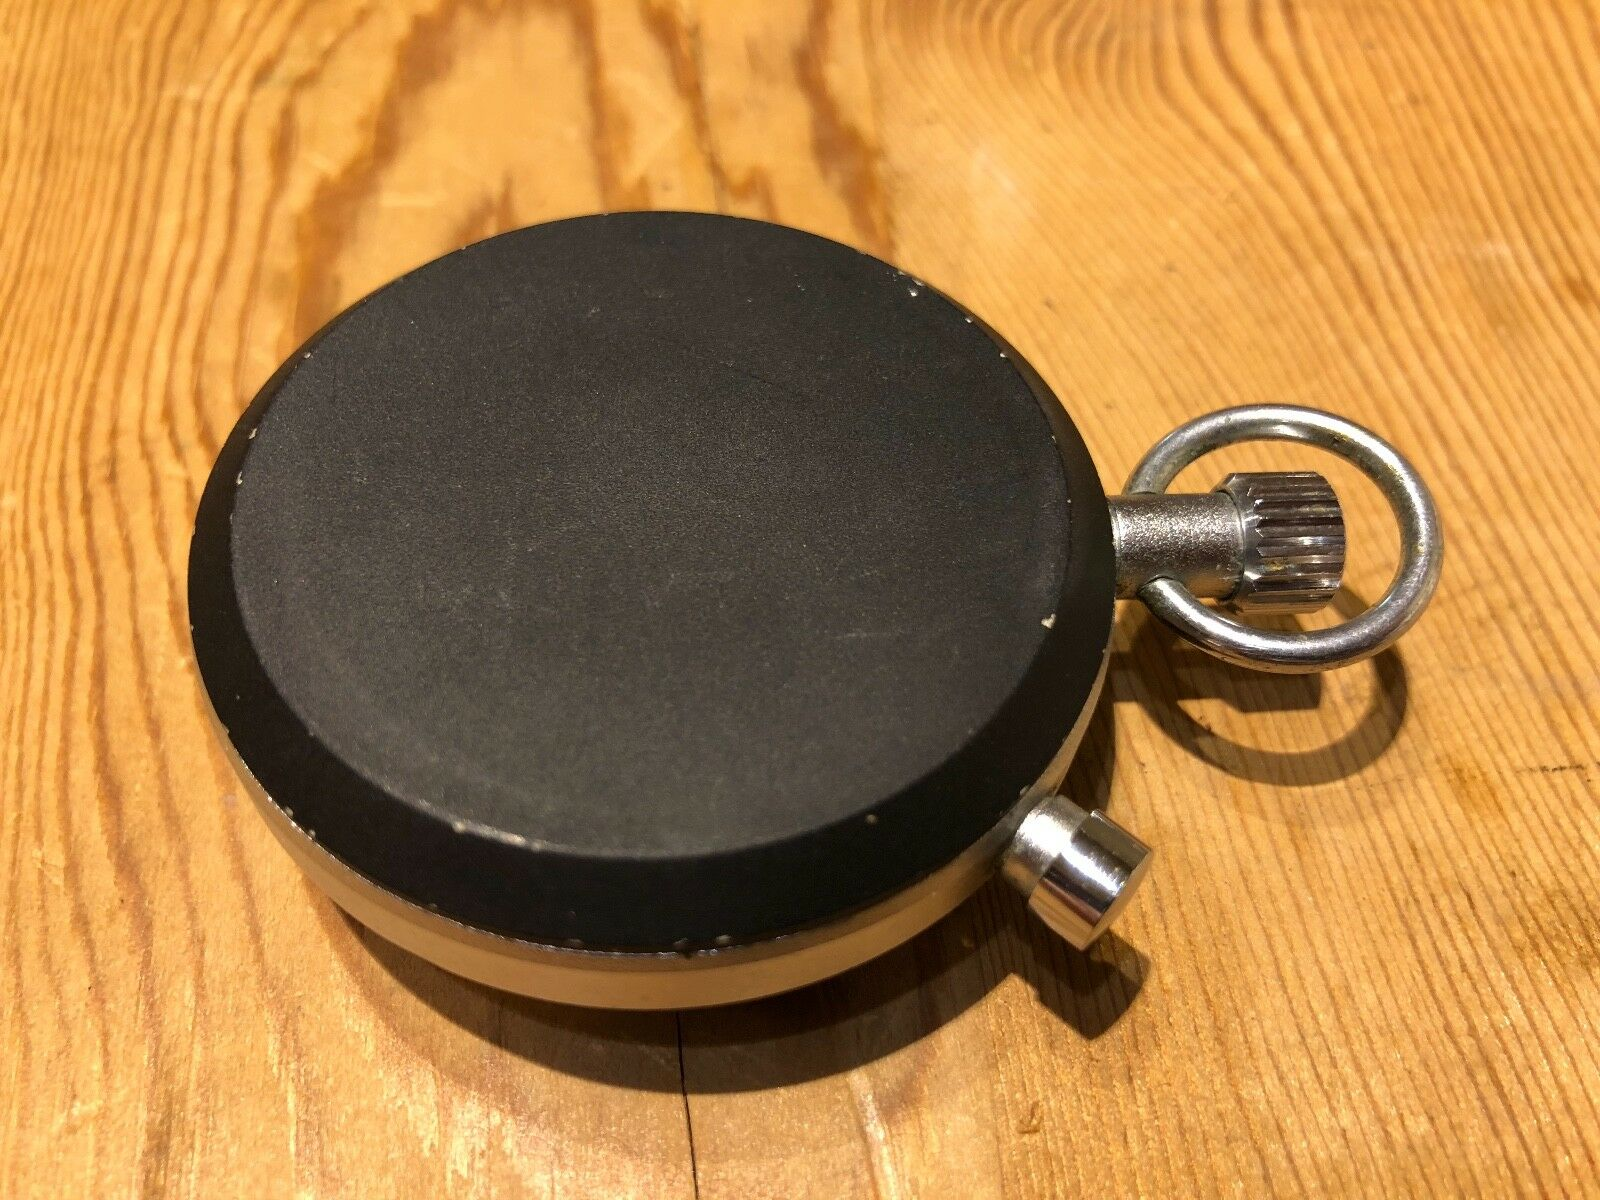 Very Rare - - - HEUER Sport Chrono - Vintage Stopwatch 53 mm diameter 24f9bb